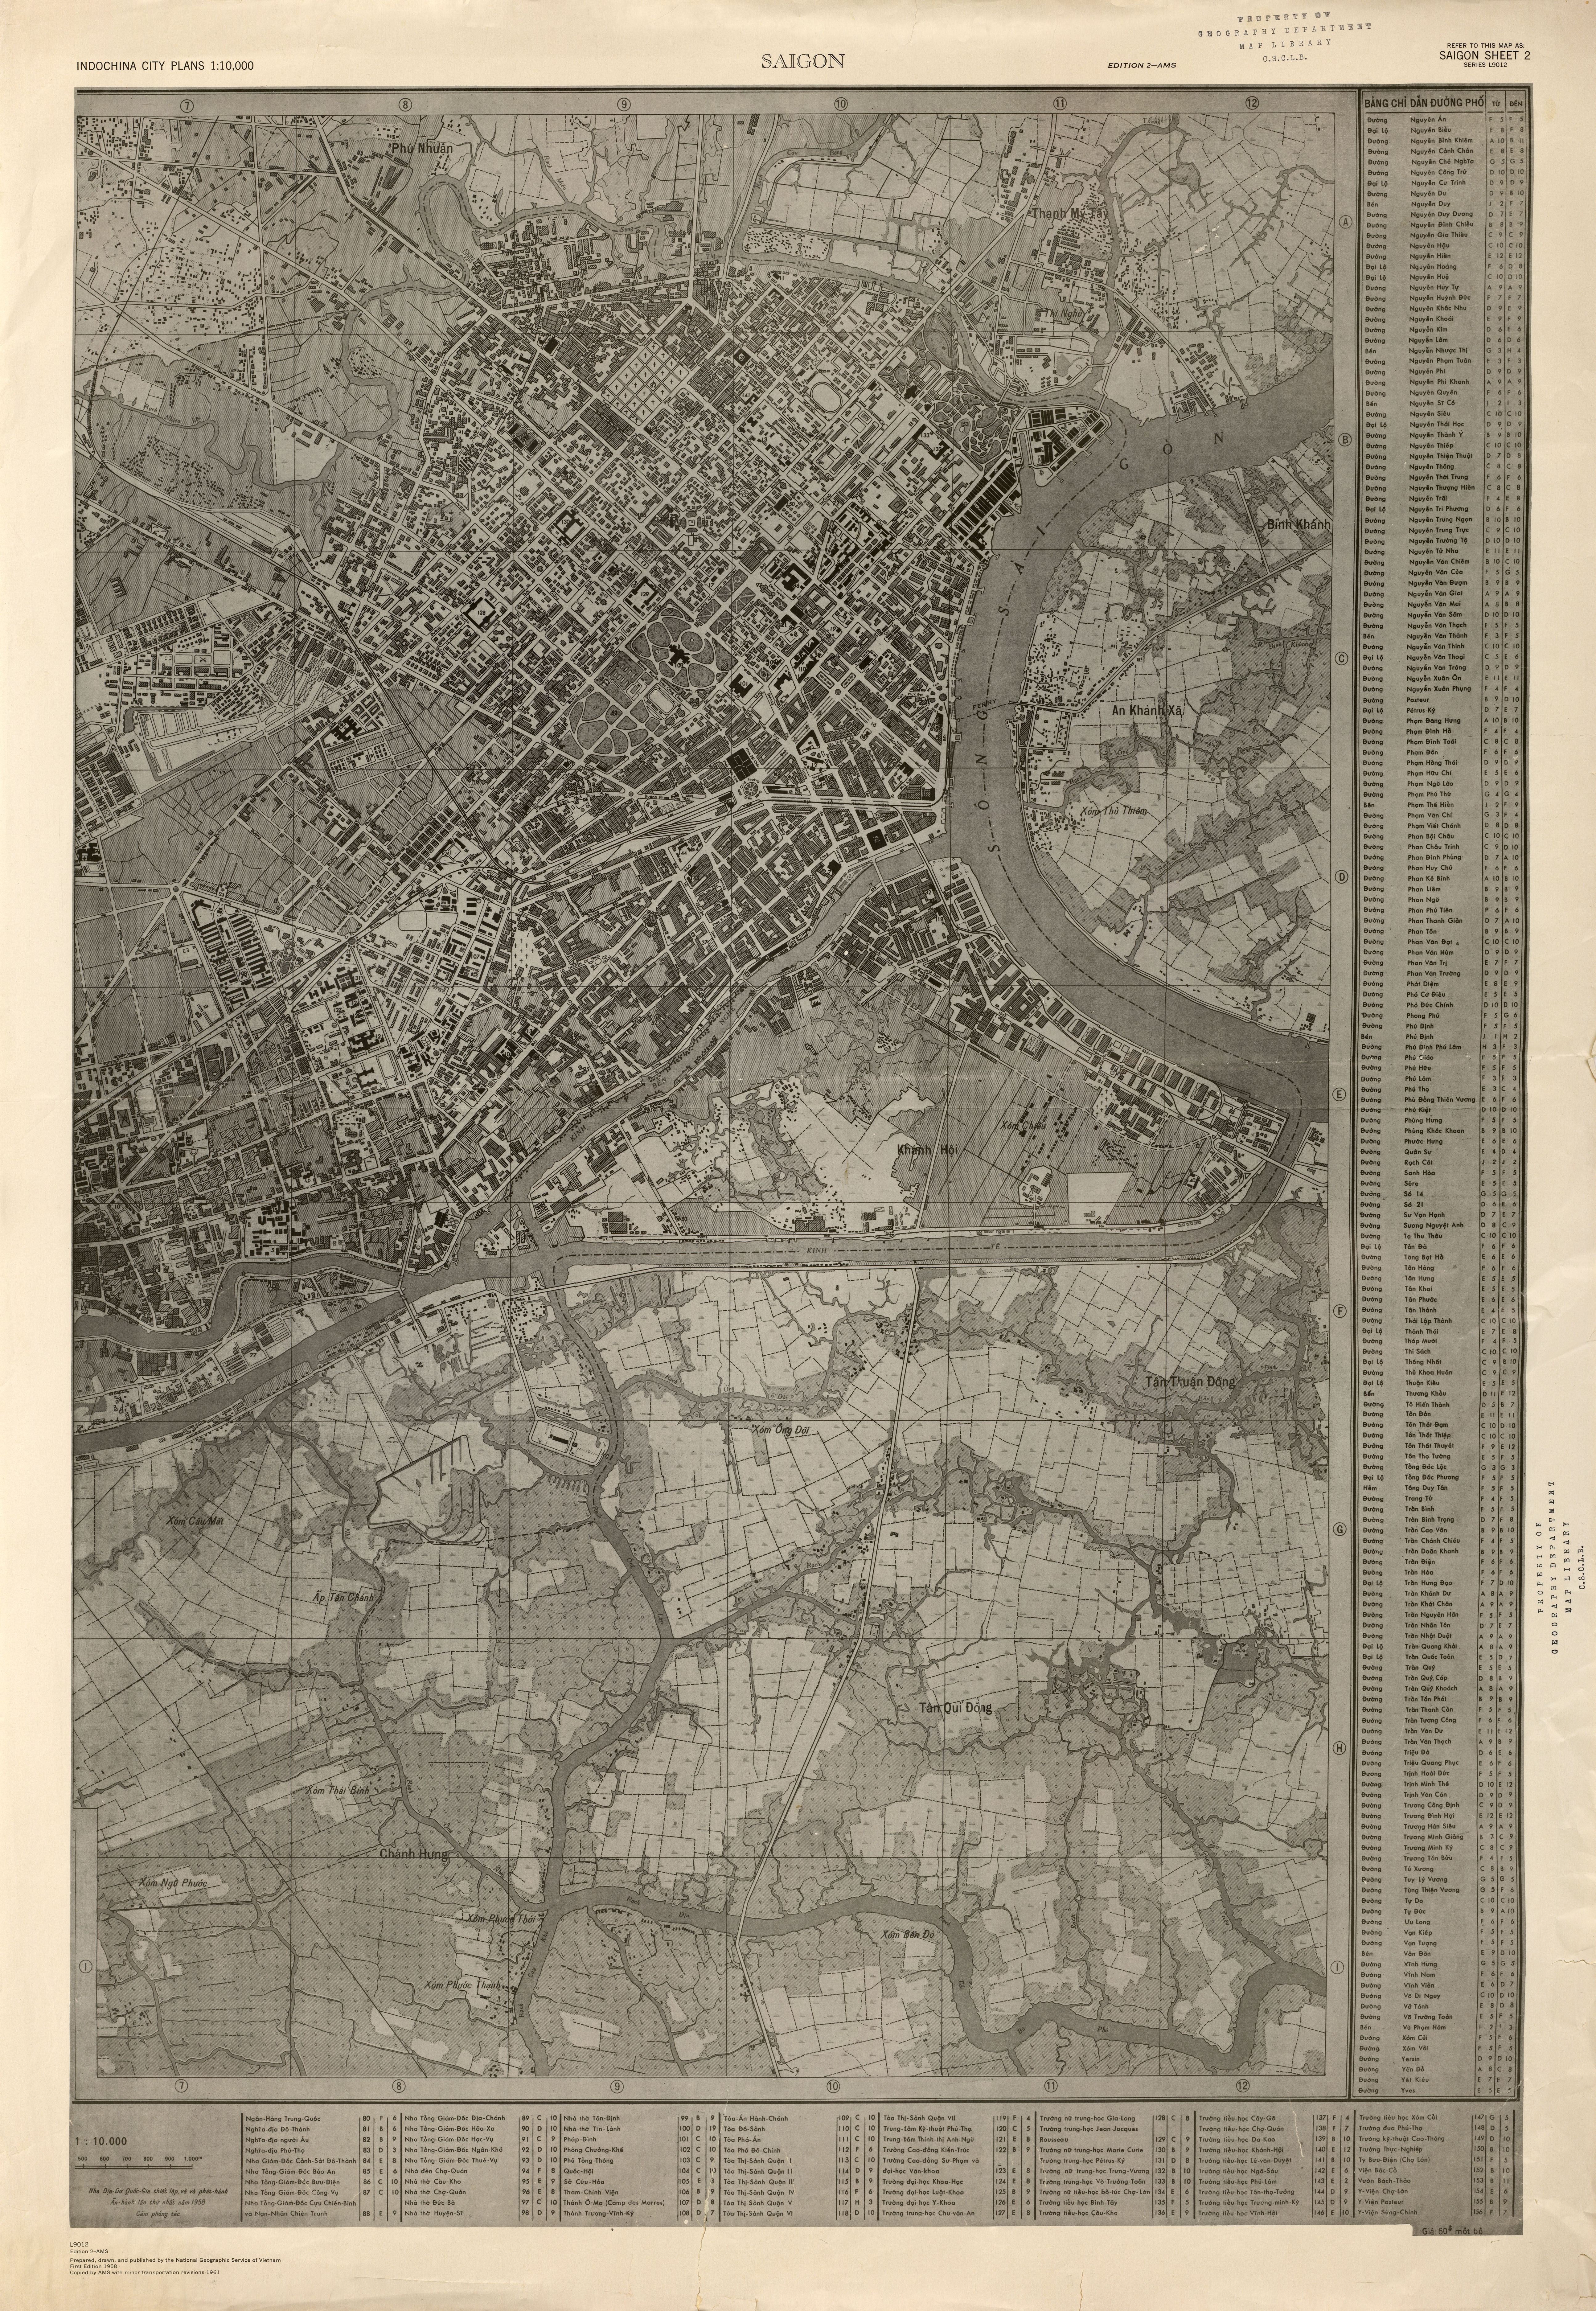 http://www.lib.utexas.edu/maps/world_cities/txu-pclmaps-saigon_sheet2-1961.jpg